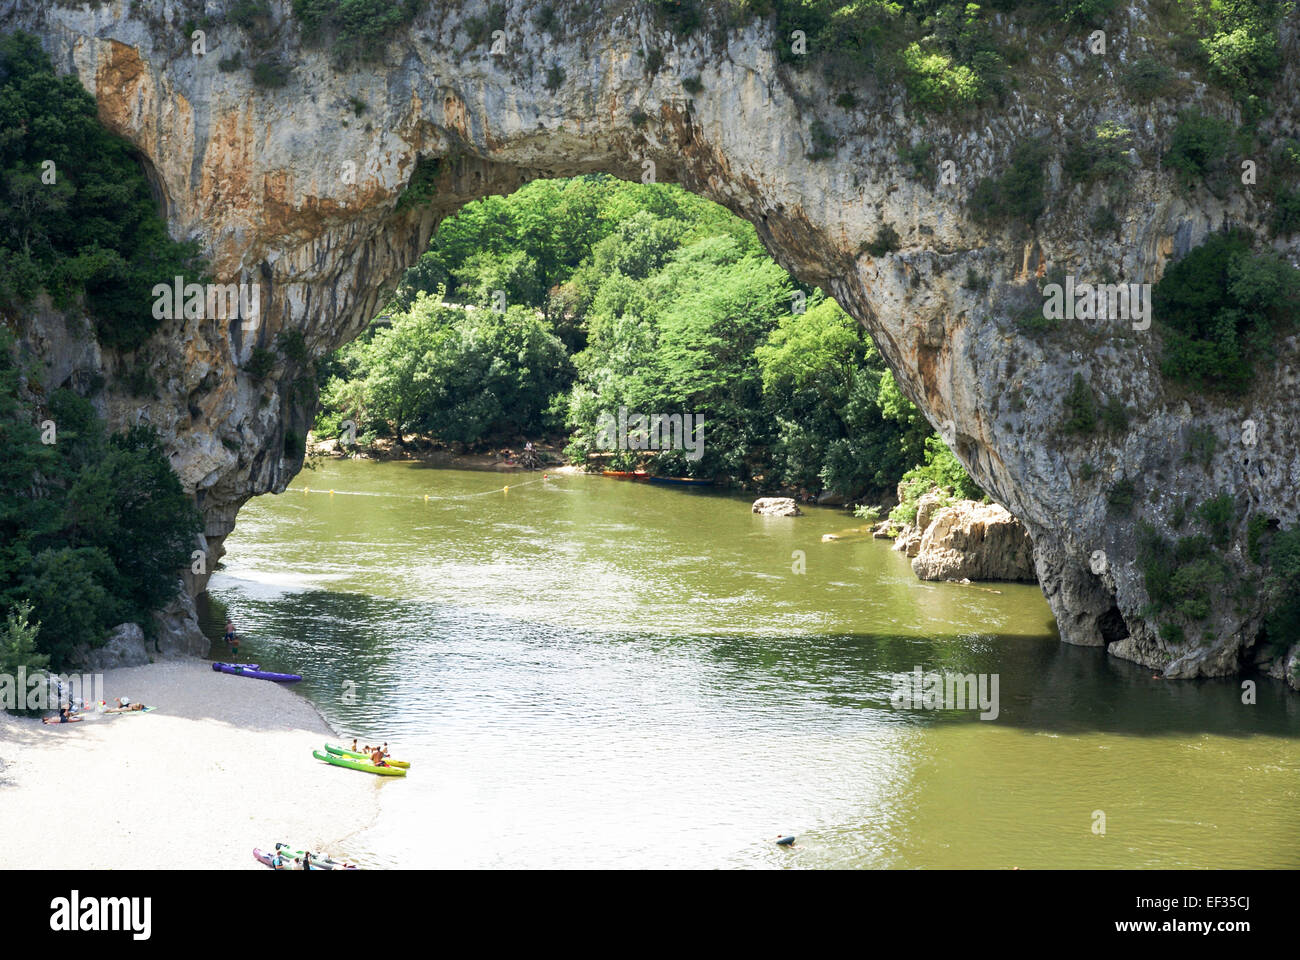 Pont d'arc natural bridge over the Ardeche River gorge, Provence, France - Stock Image